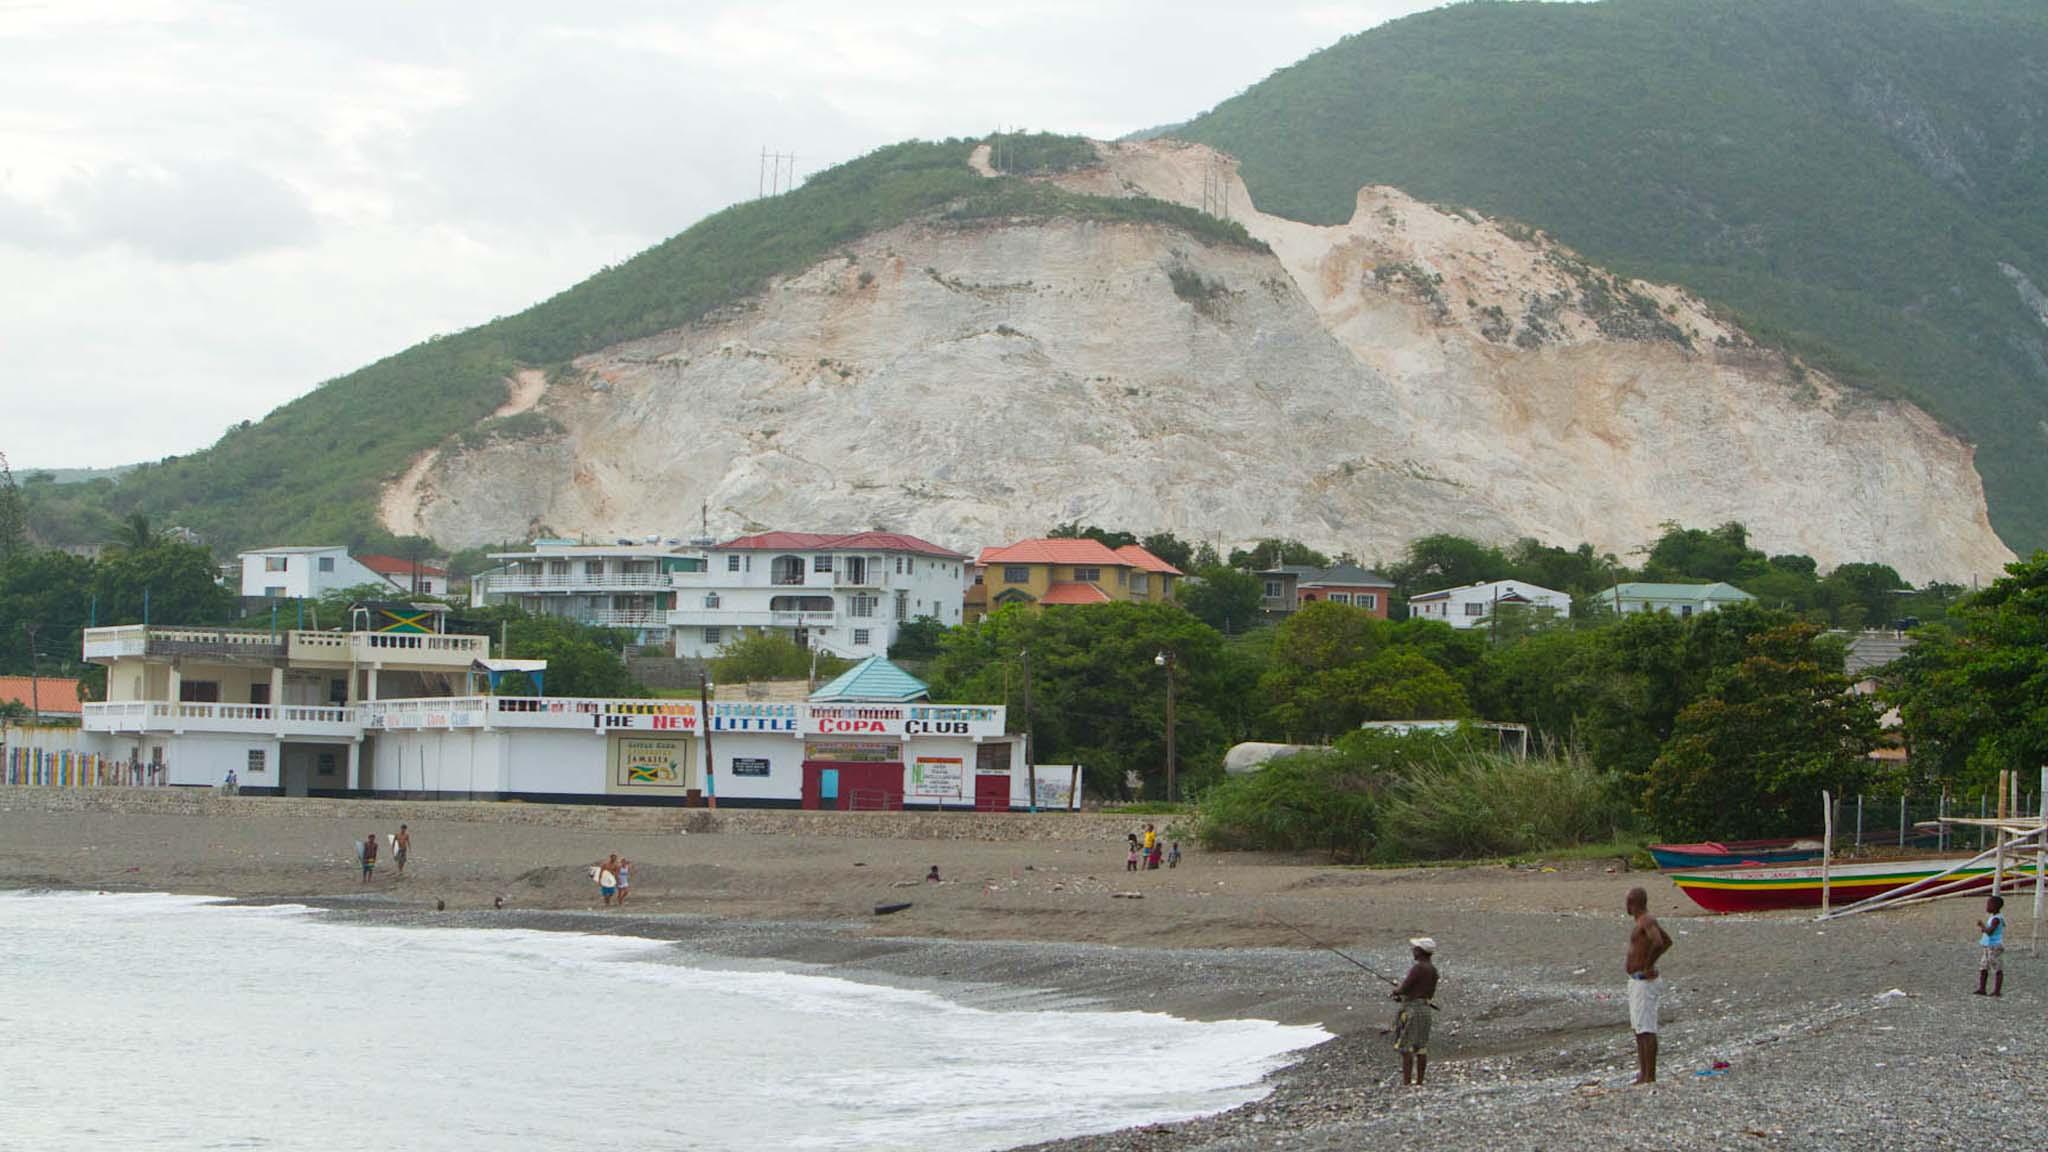 St. Thomas, Jamaica